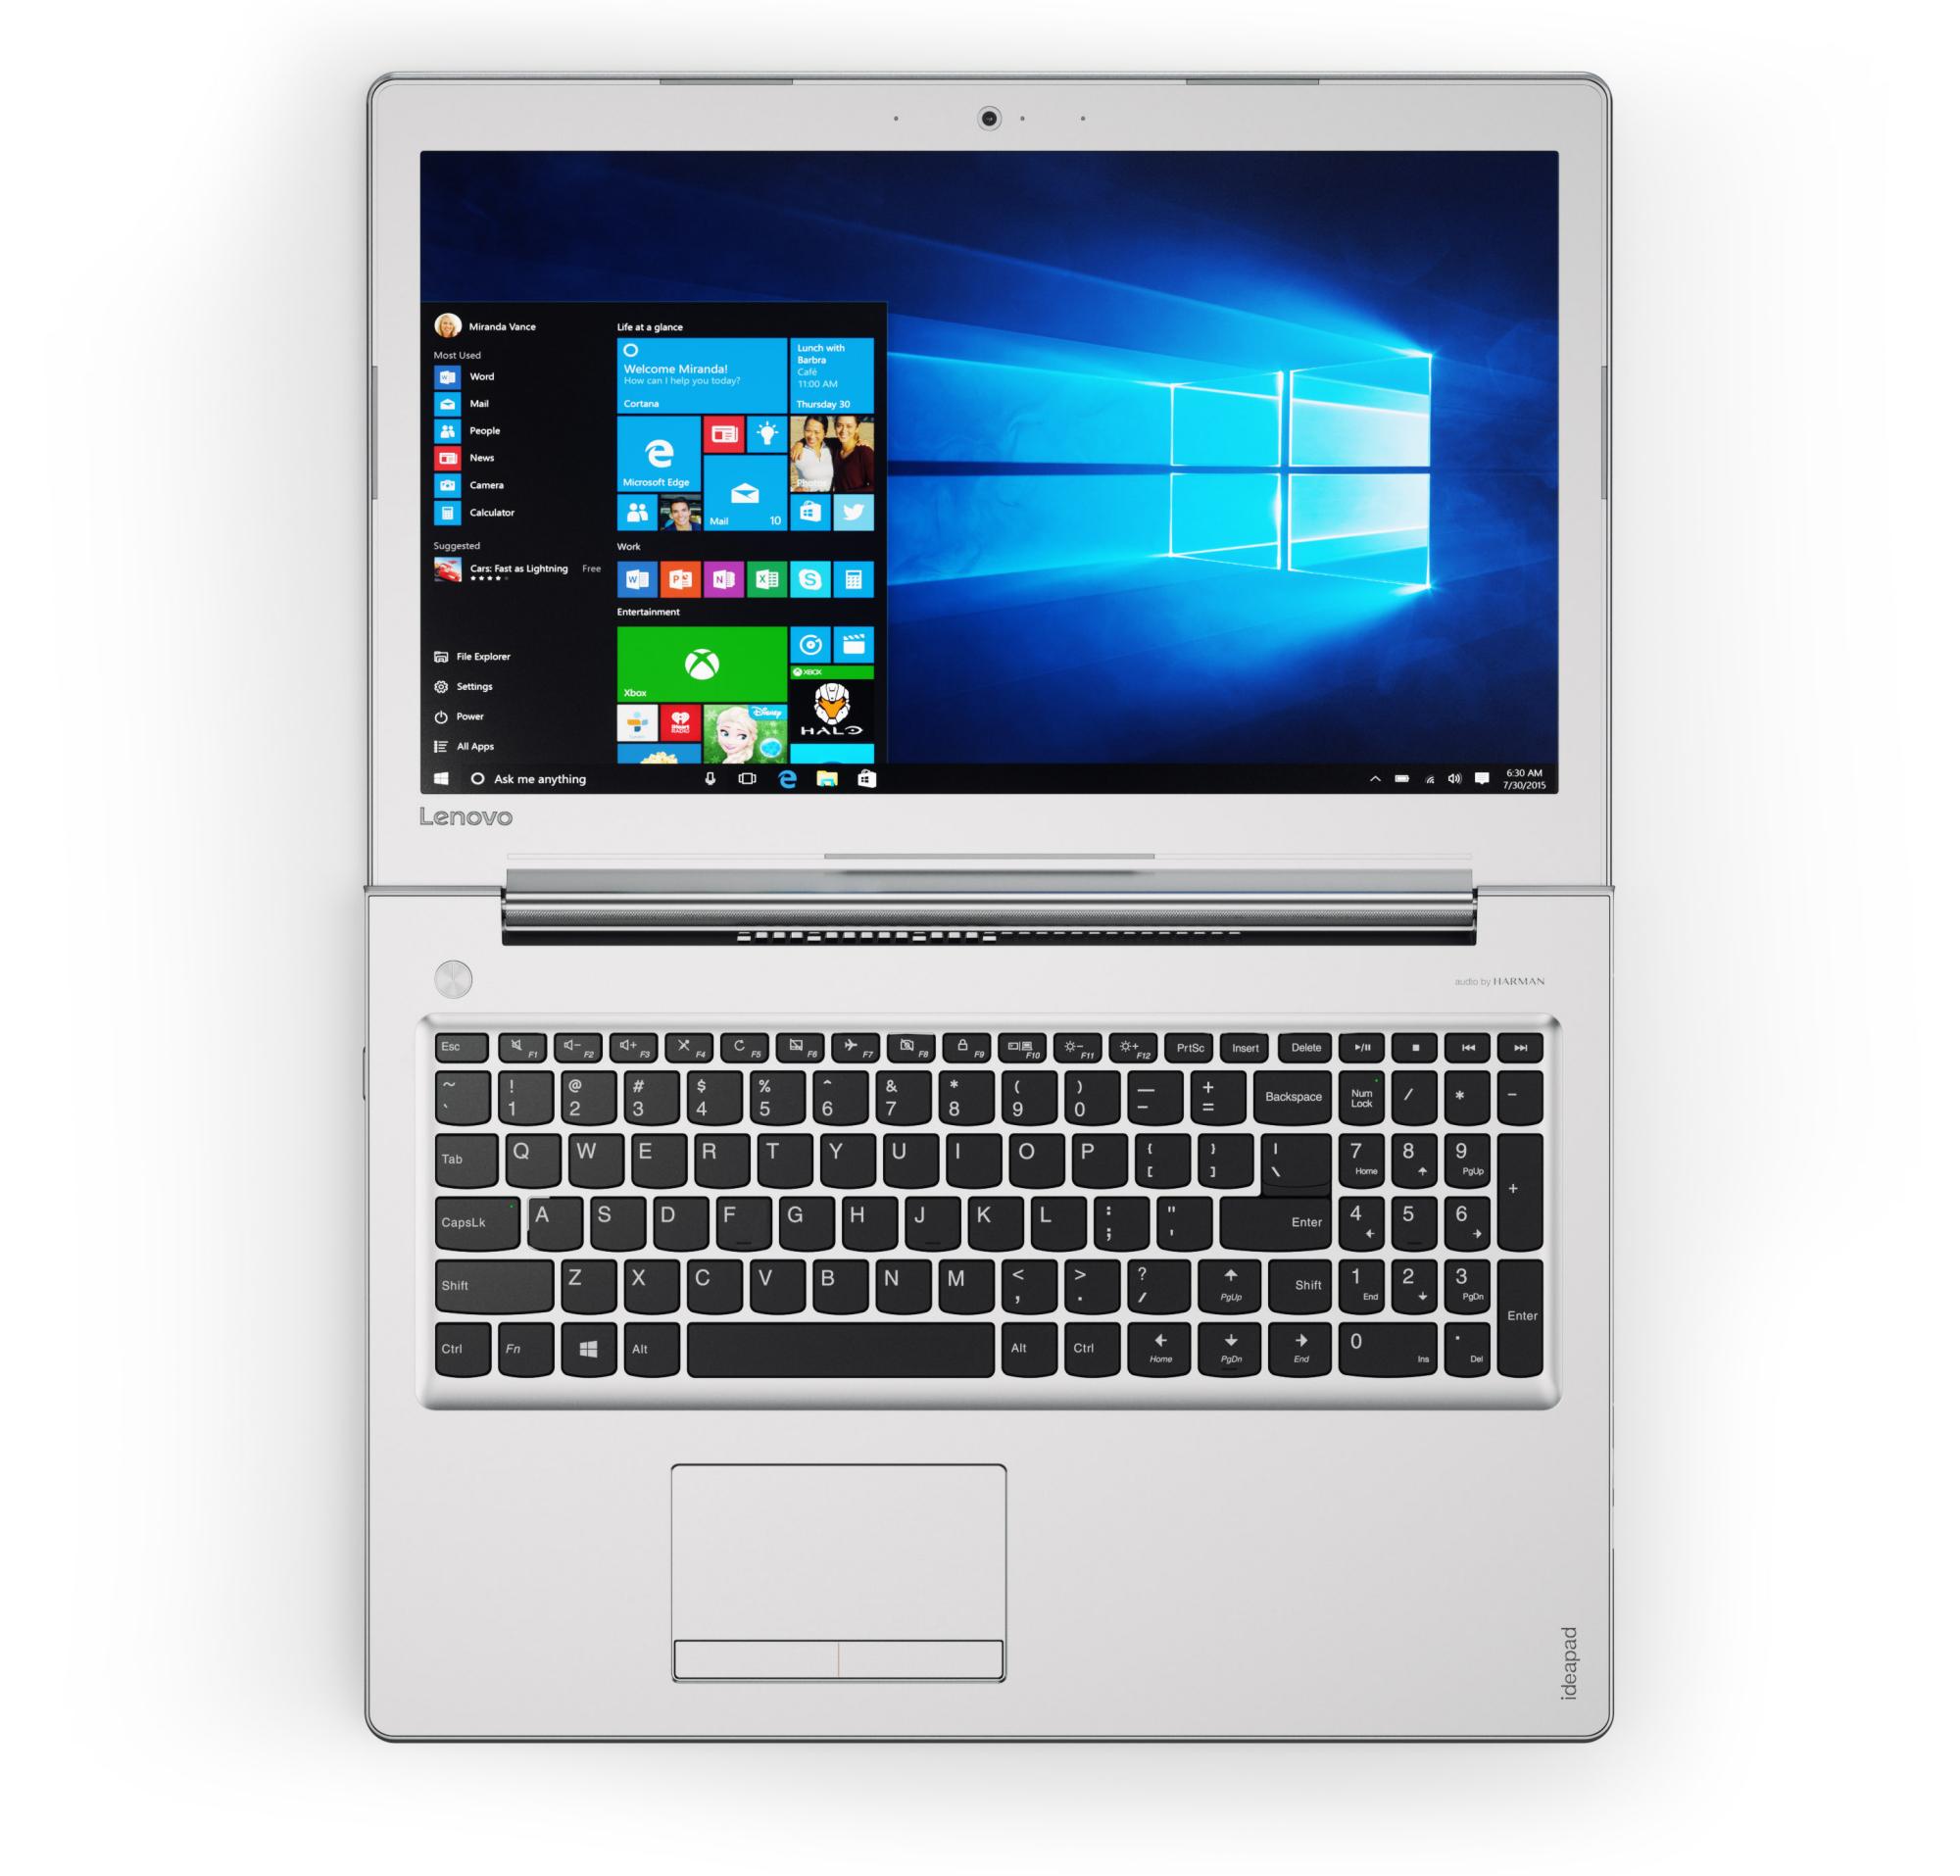 Lenovo Ideapad 510 15ikb Notebook Review Reviews Lcd Led 14 0 Slim Standart 30 Pin Untuk Laptop Full Resolution